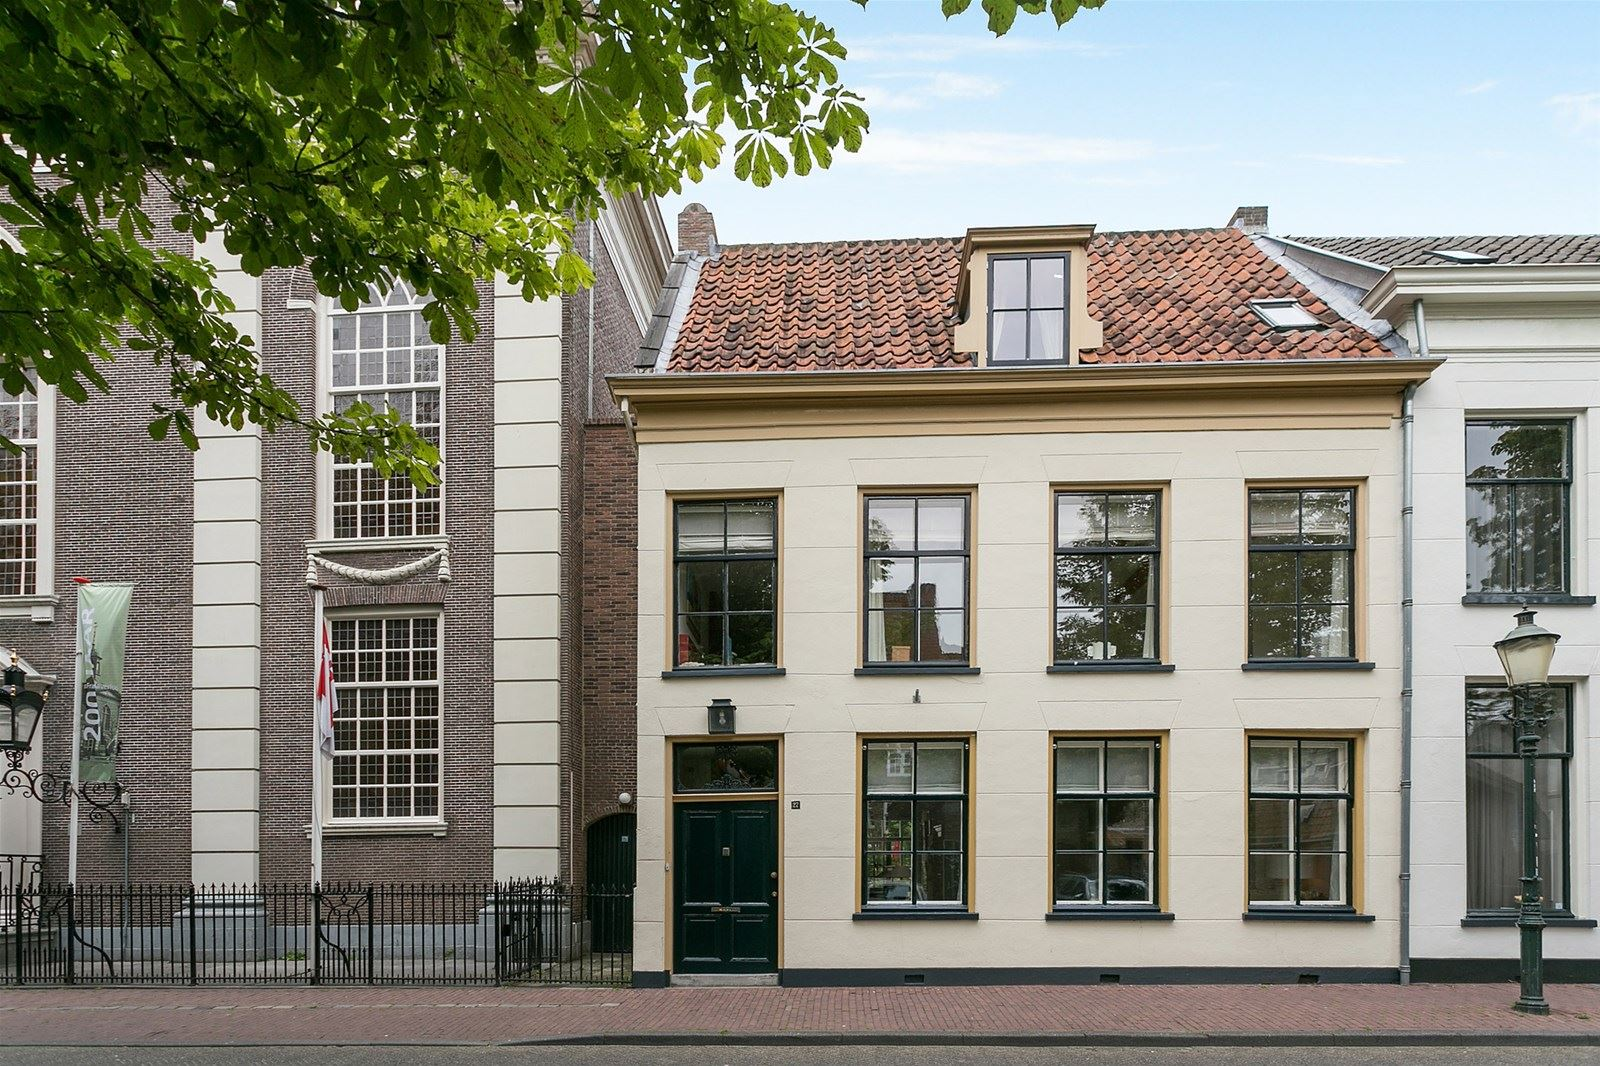 House for sale: \'t Zand 27 3811 GB Amersfoort [funda]